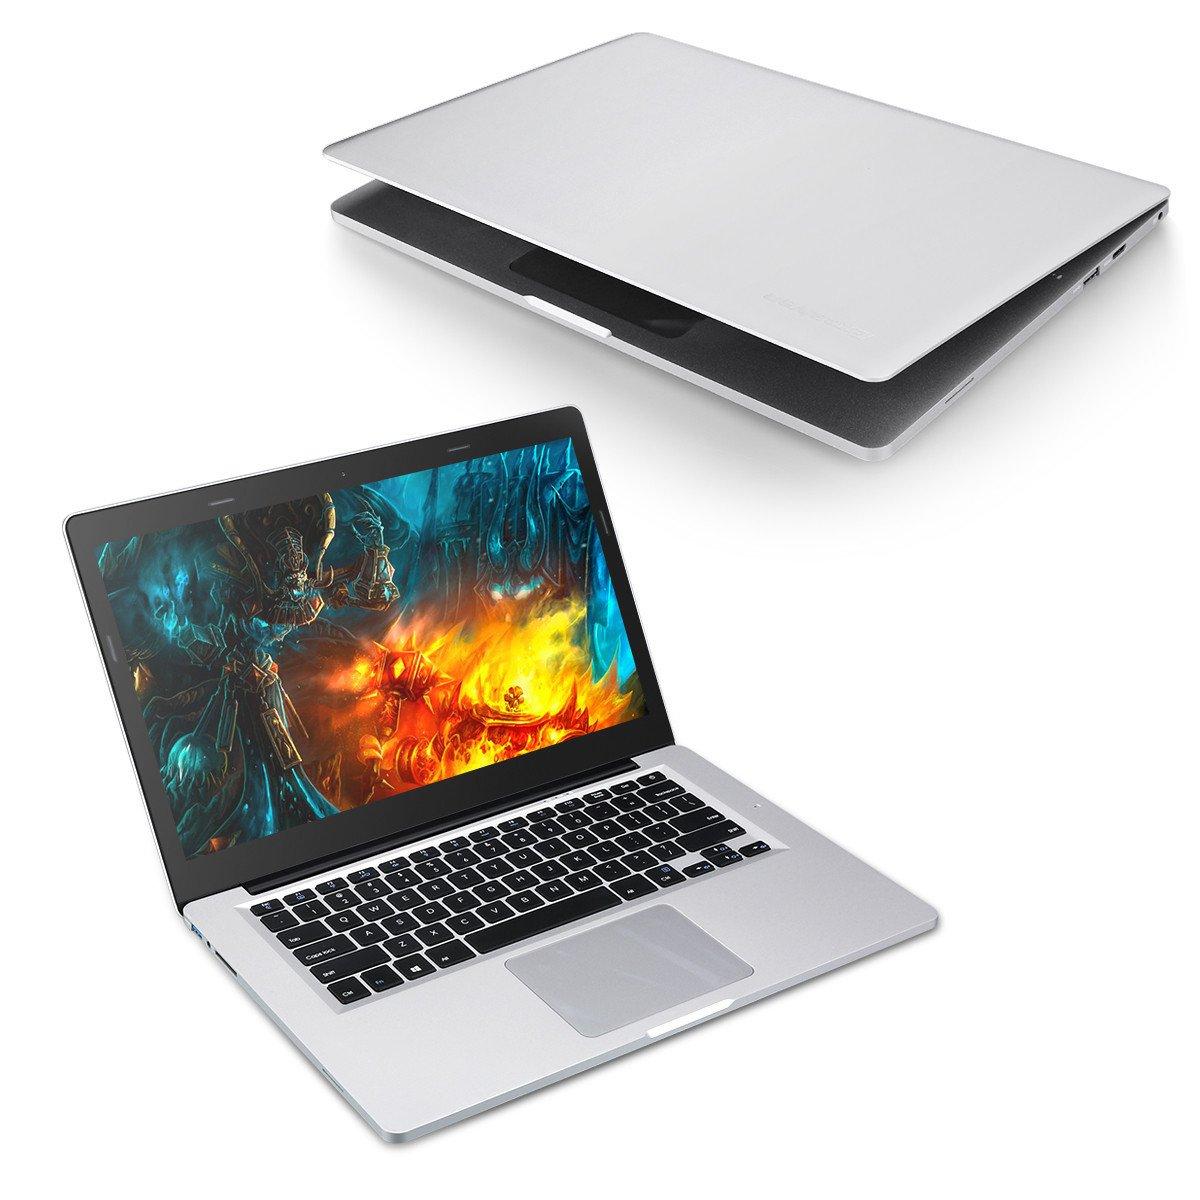 Excelvan X8 Pro Notebook de14.1 Pulgadas (Windows 10,Intel Celeron J3455 Quad Core, 6GB RAM +64GB ROM,Pantalla IPS,HDMI) Portátil Plata